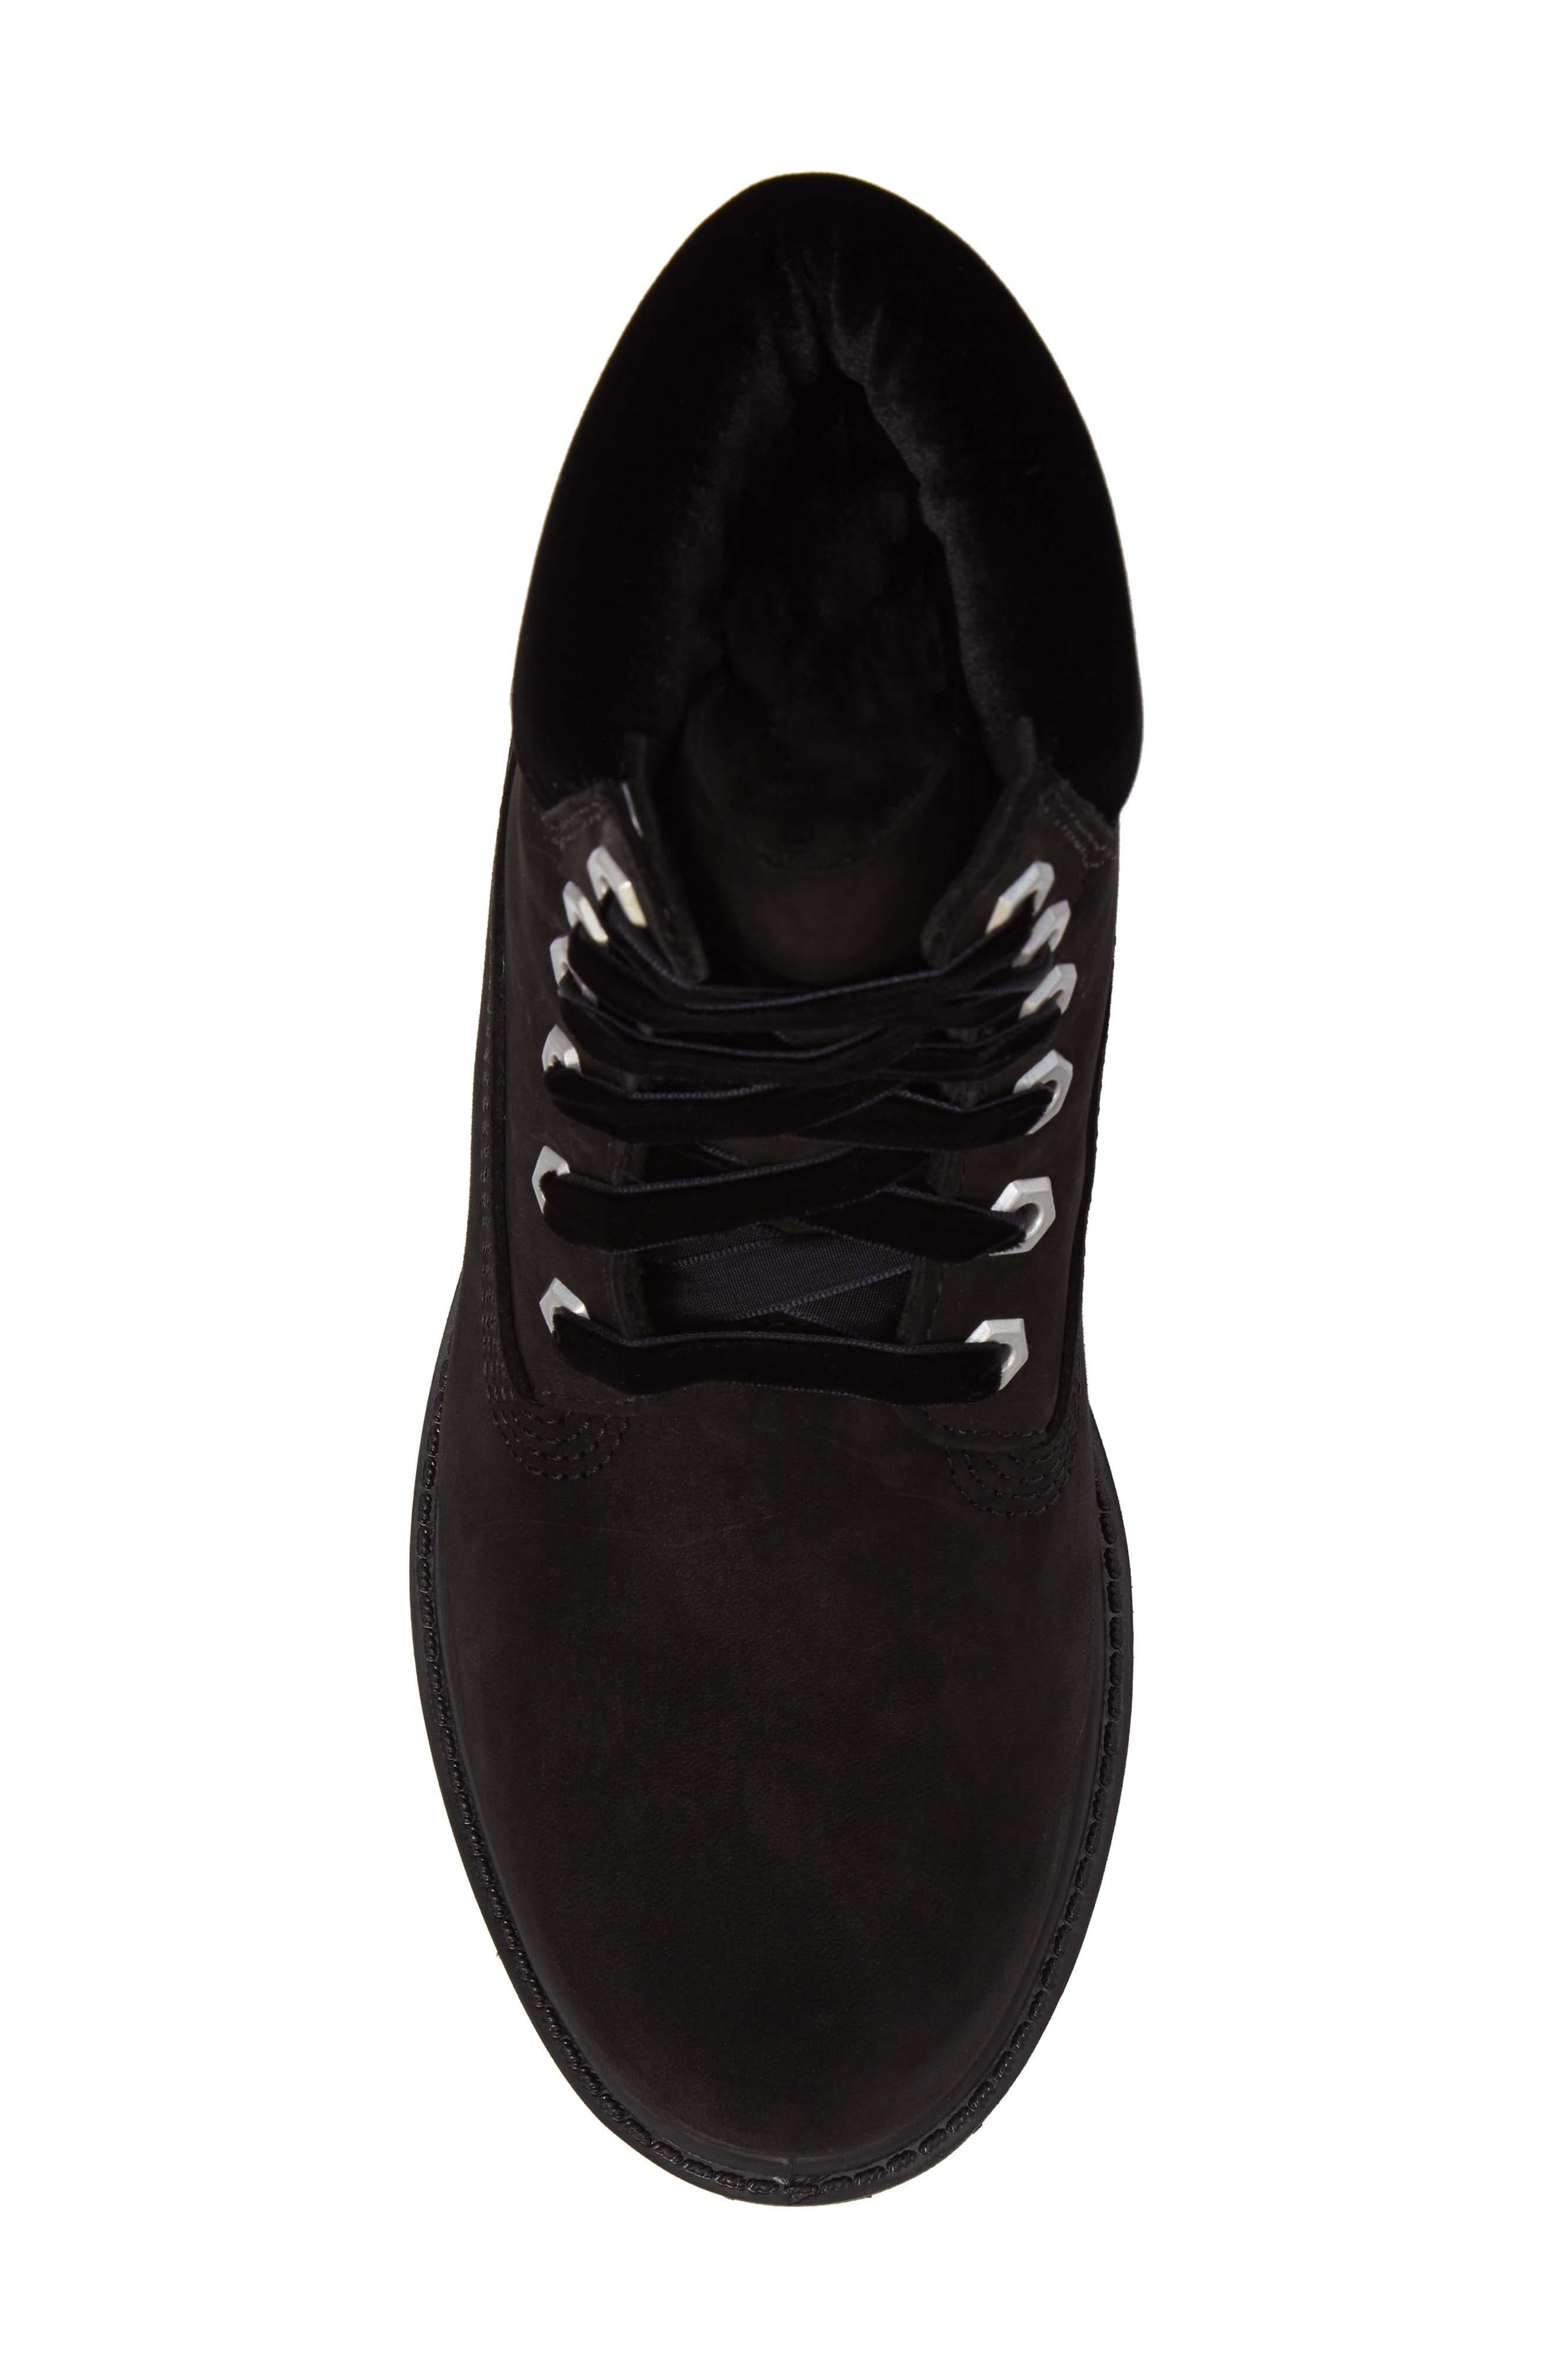 6-Inch Premium Boot,                             Alternate thumbnail 5, color,                             001